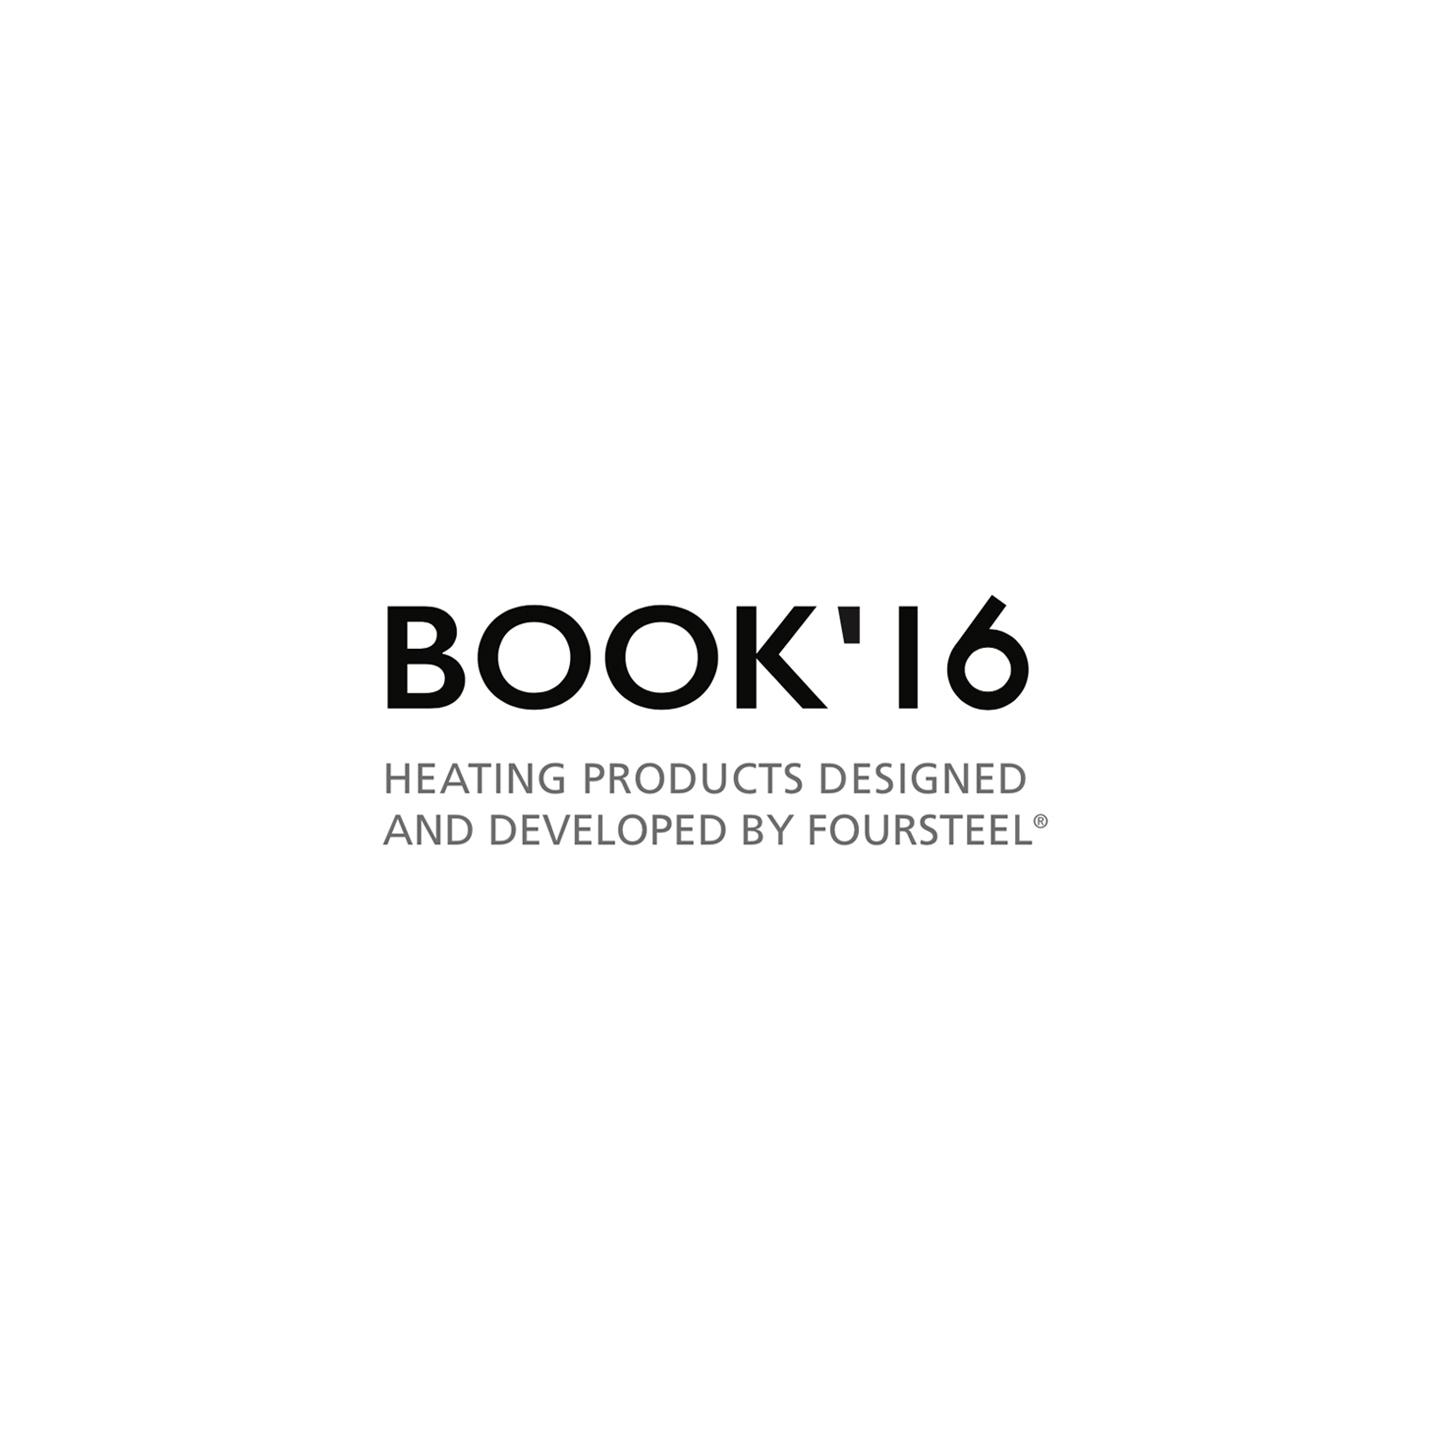 BOOK 16 EUROPE